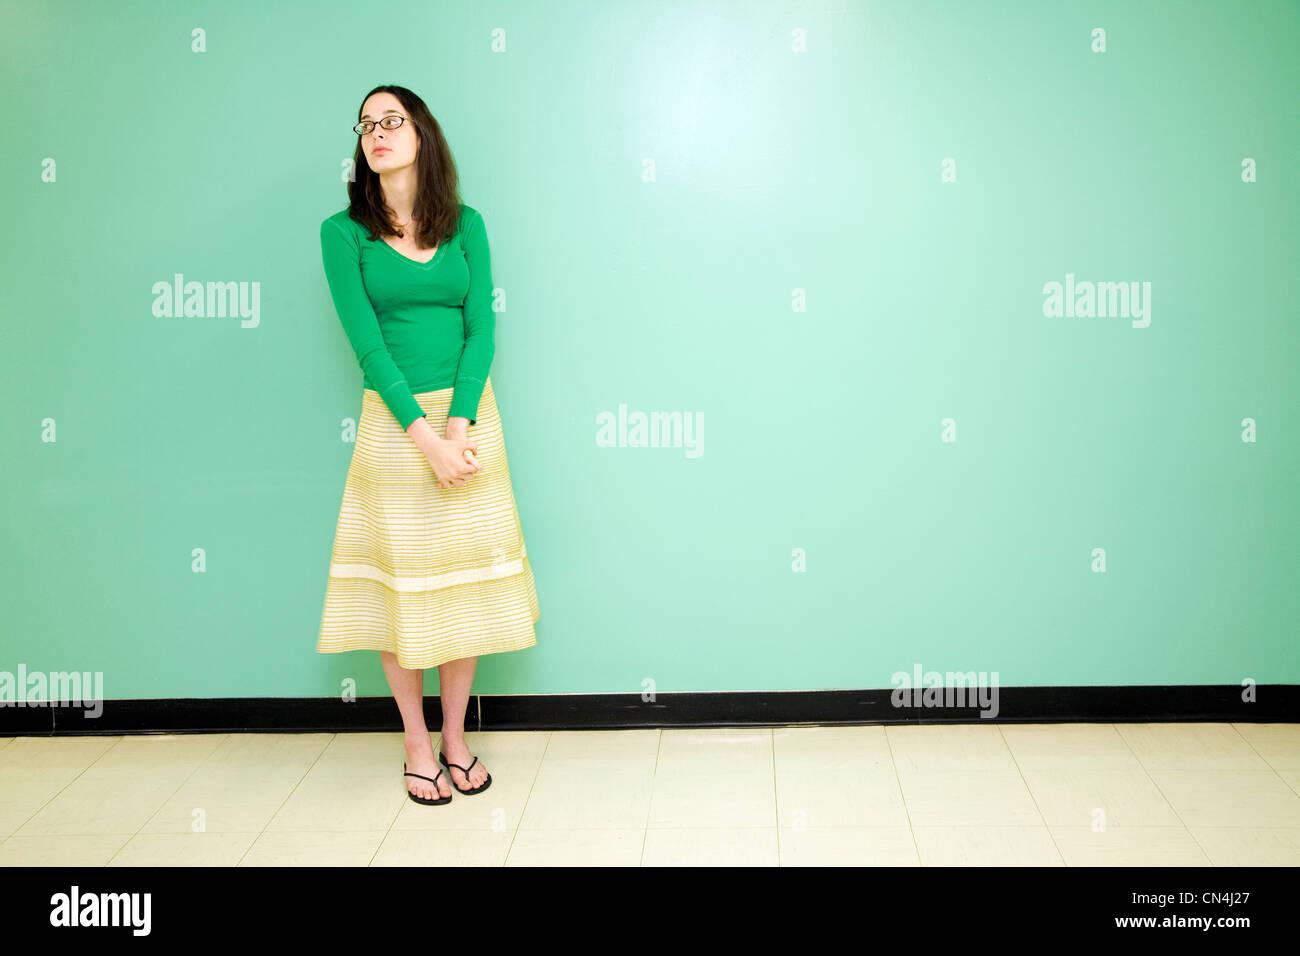 Junge Frau gegen eine grüne Wand Stockbild